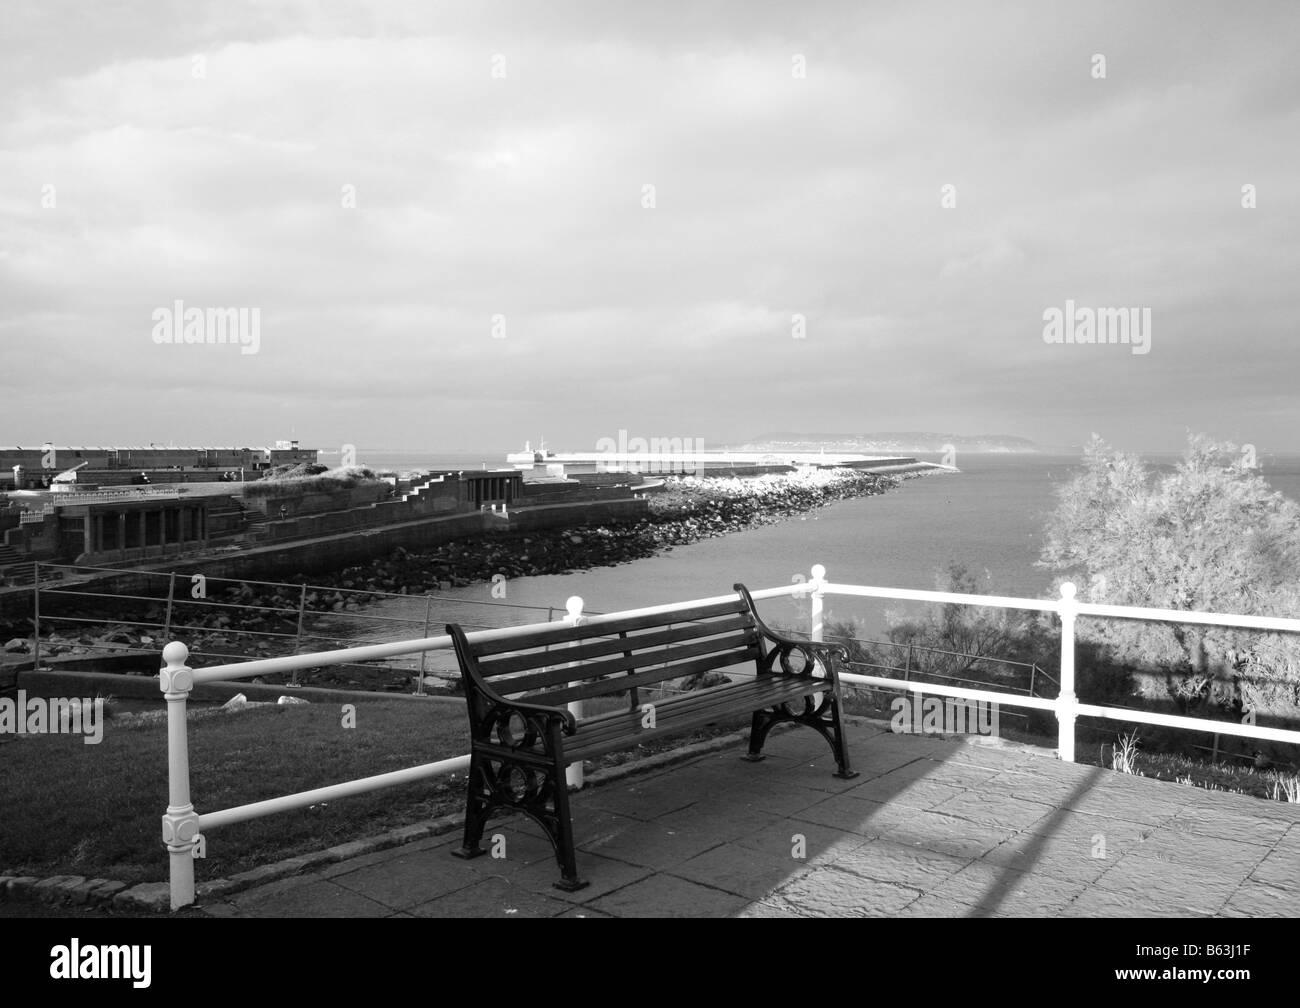 East Pier DunLaoghaire Pier Co Dublin CoDublin County Ireland Dun Laoghaire Eire Bench Black and White - Stock Image